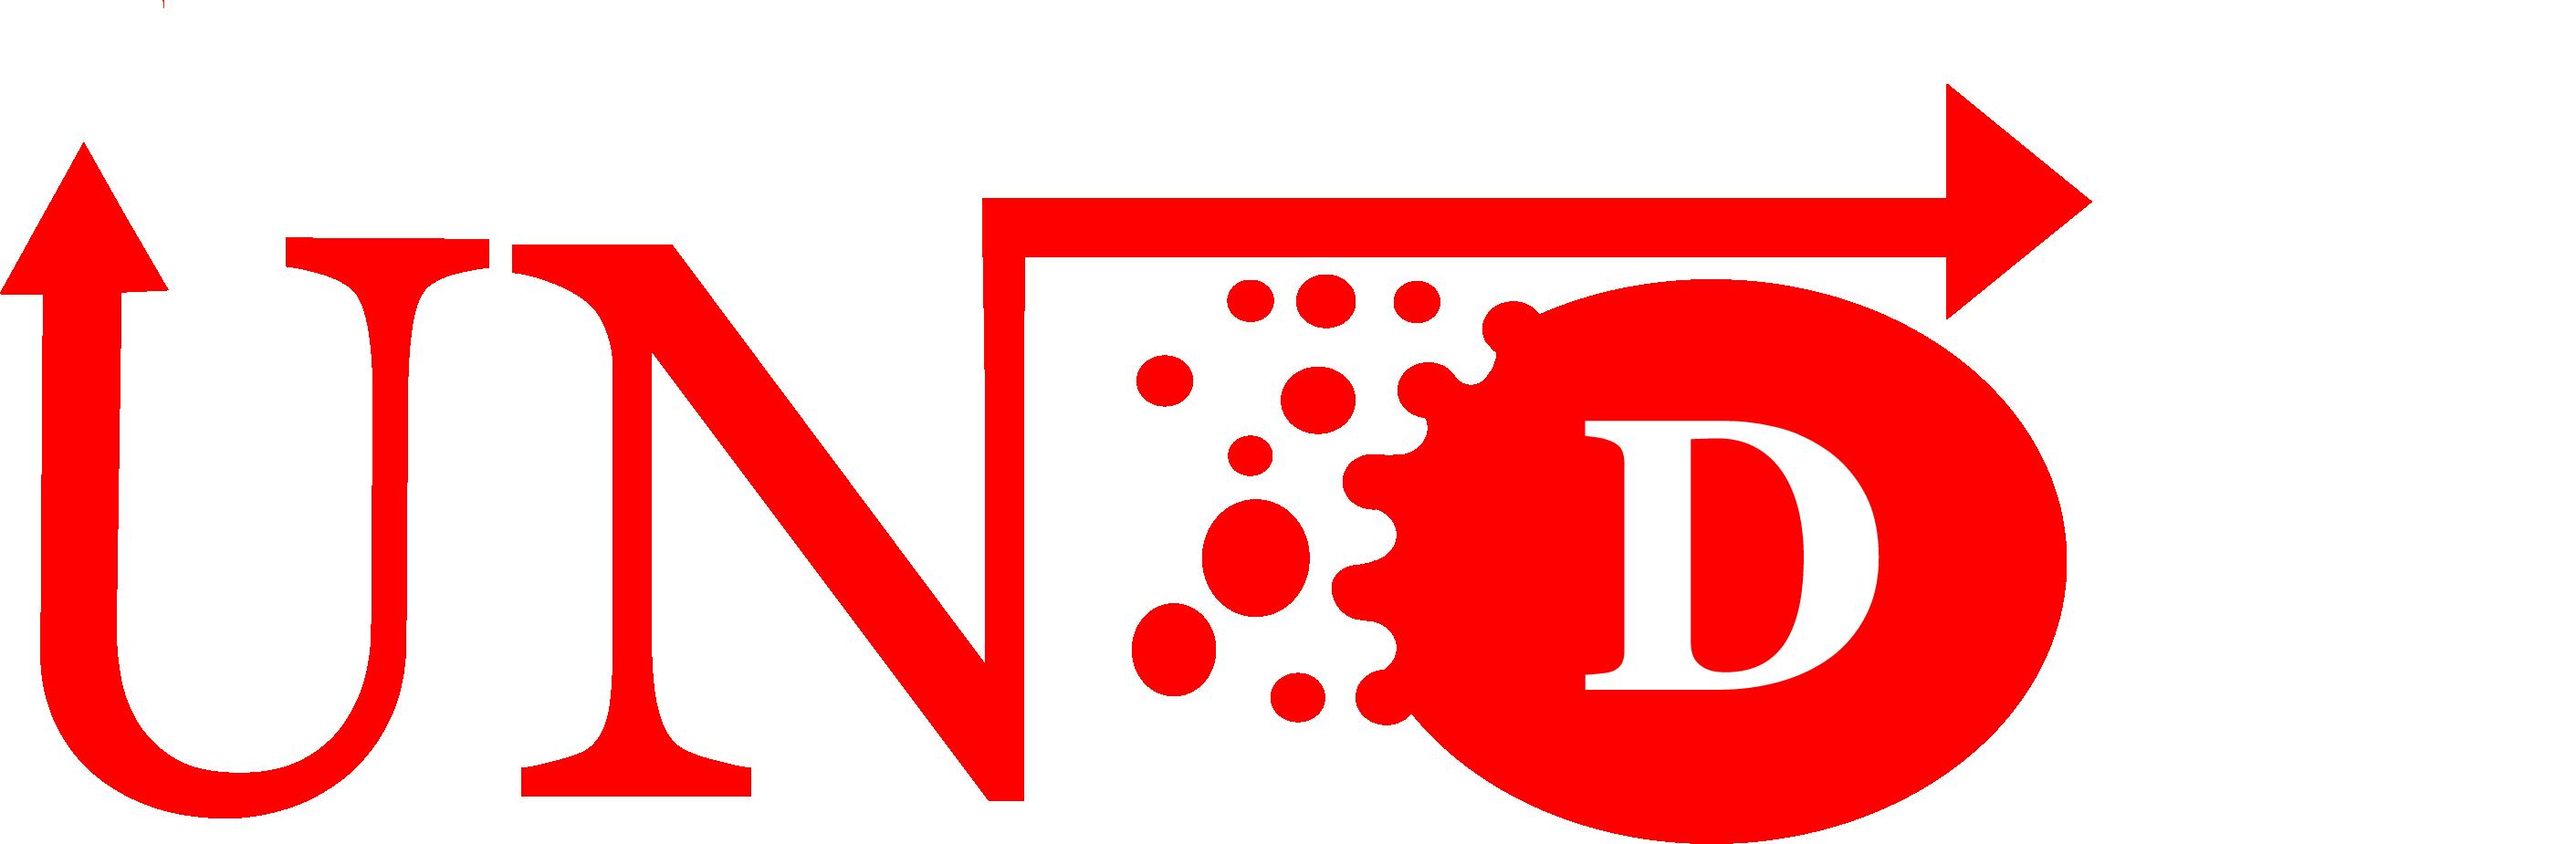 UpNext Designs Logo